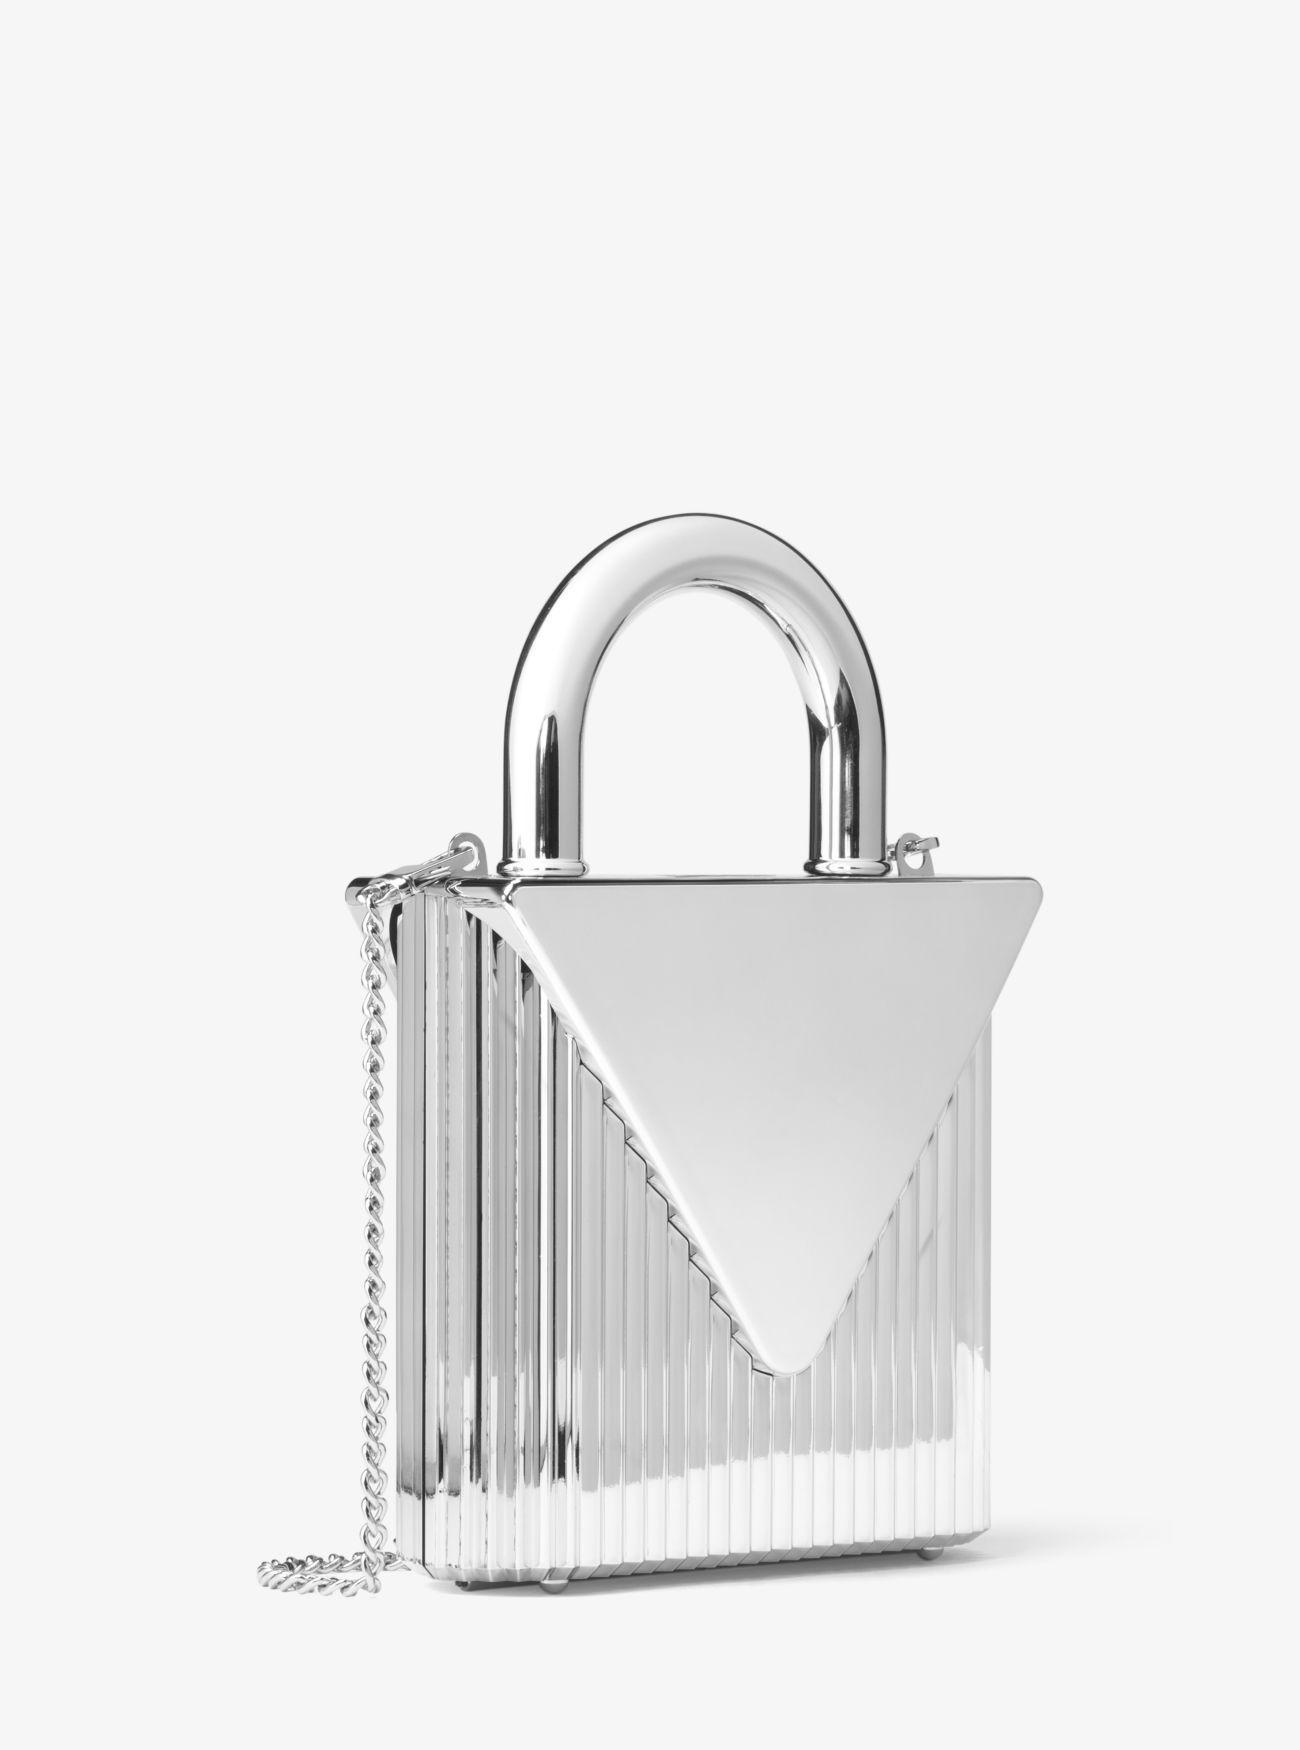 3c4f21604d17 Lyst - Michael Kors Mercer Lock Clutch in Metallic